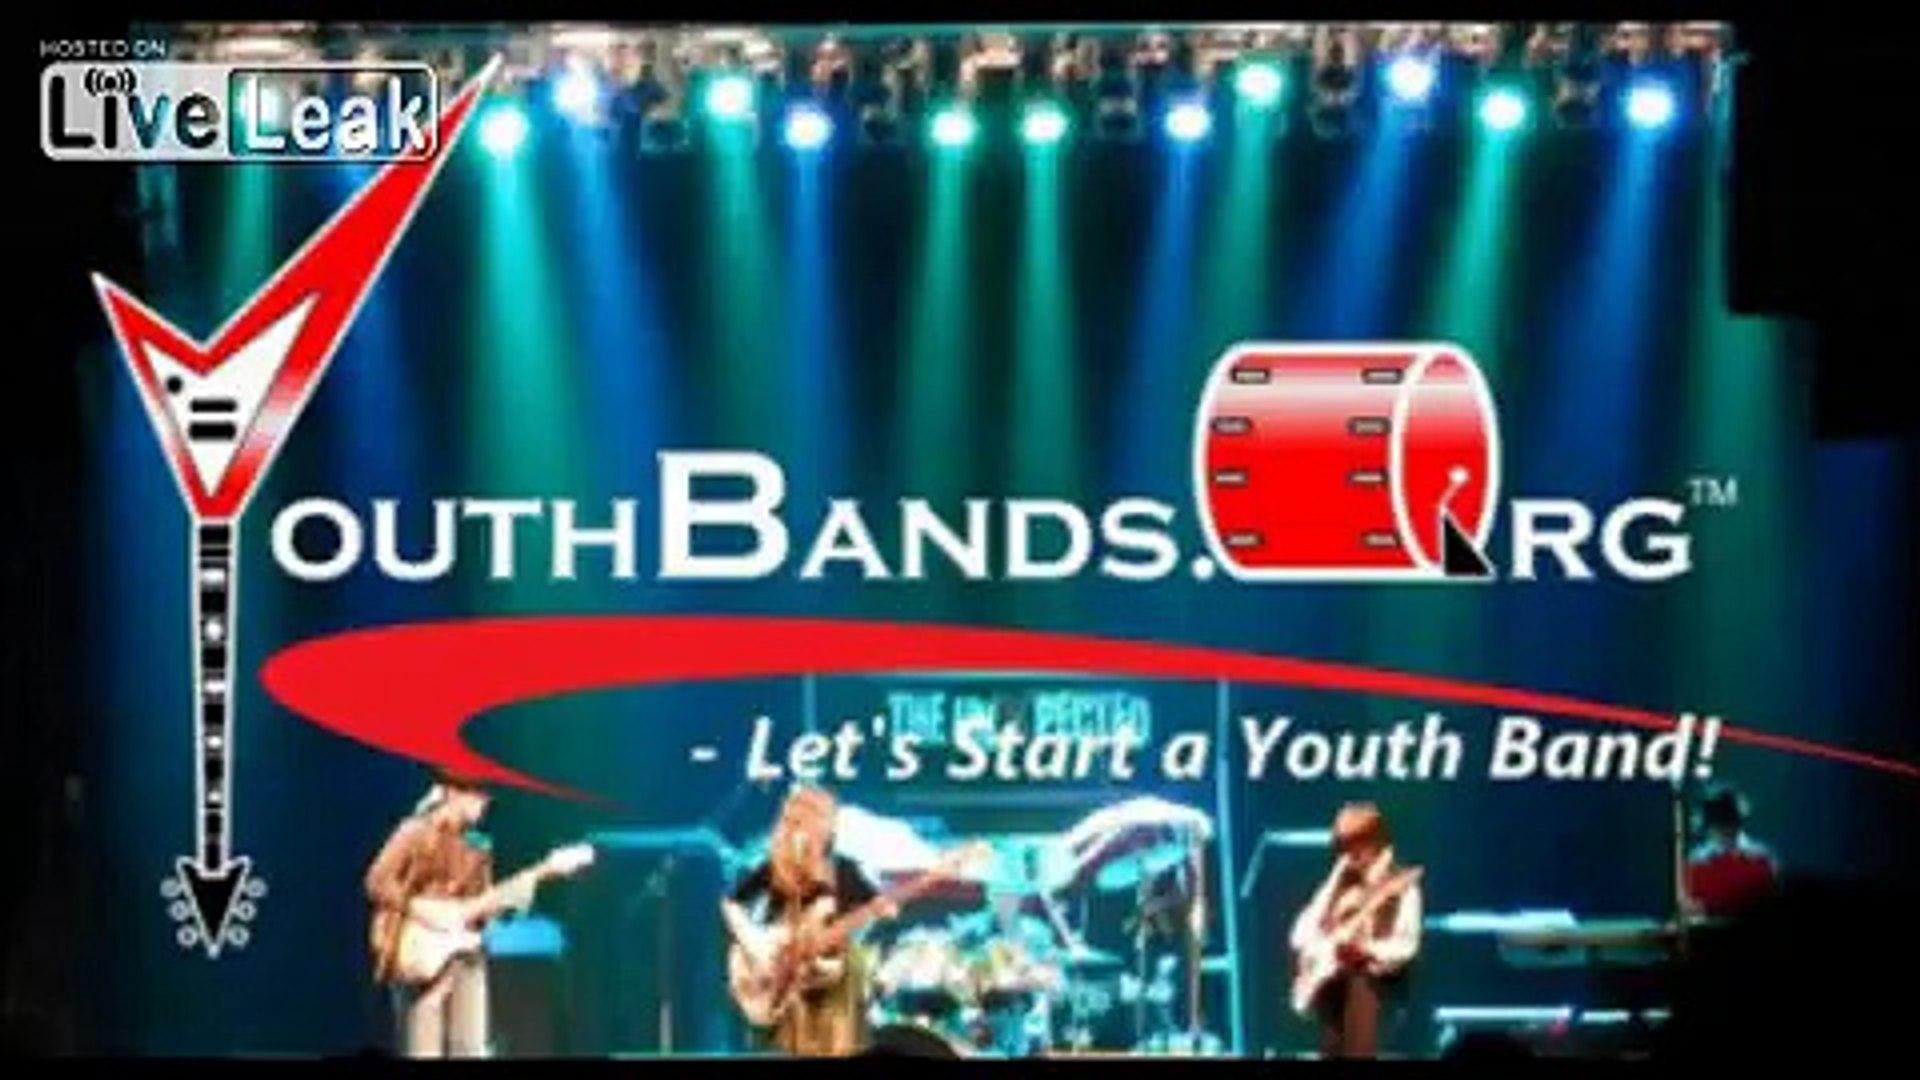 YouthBands Hampton Virginia Youth Non-Profit Organization